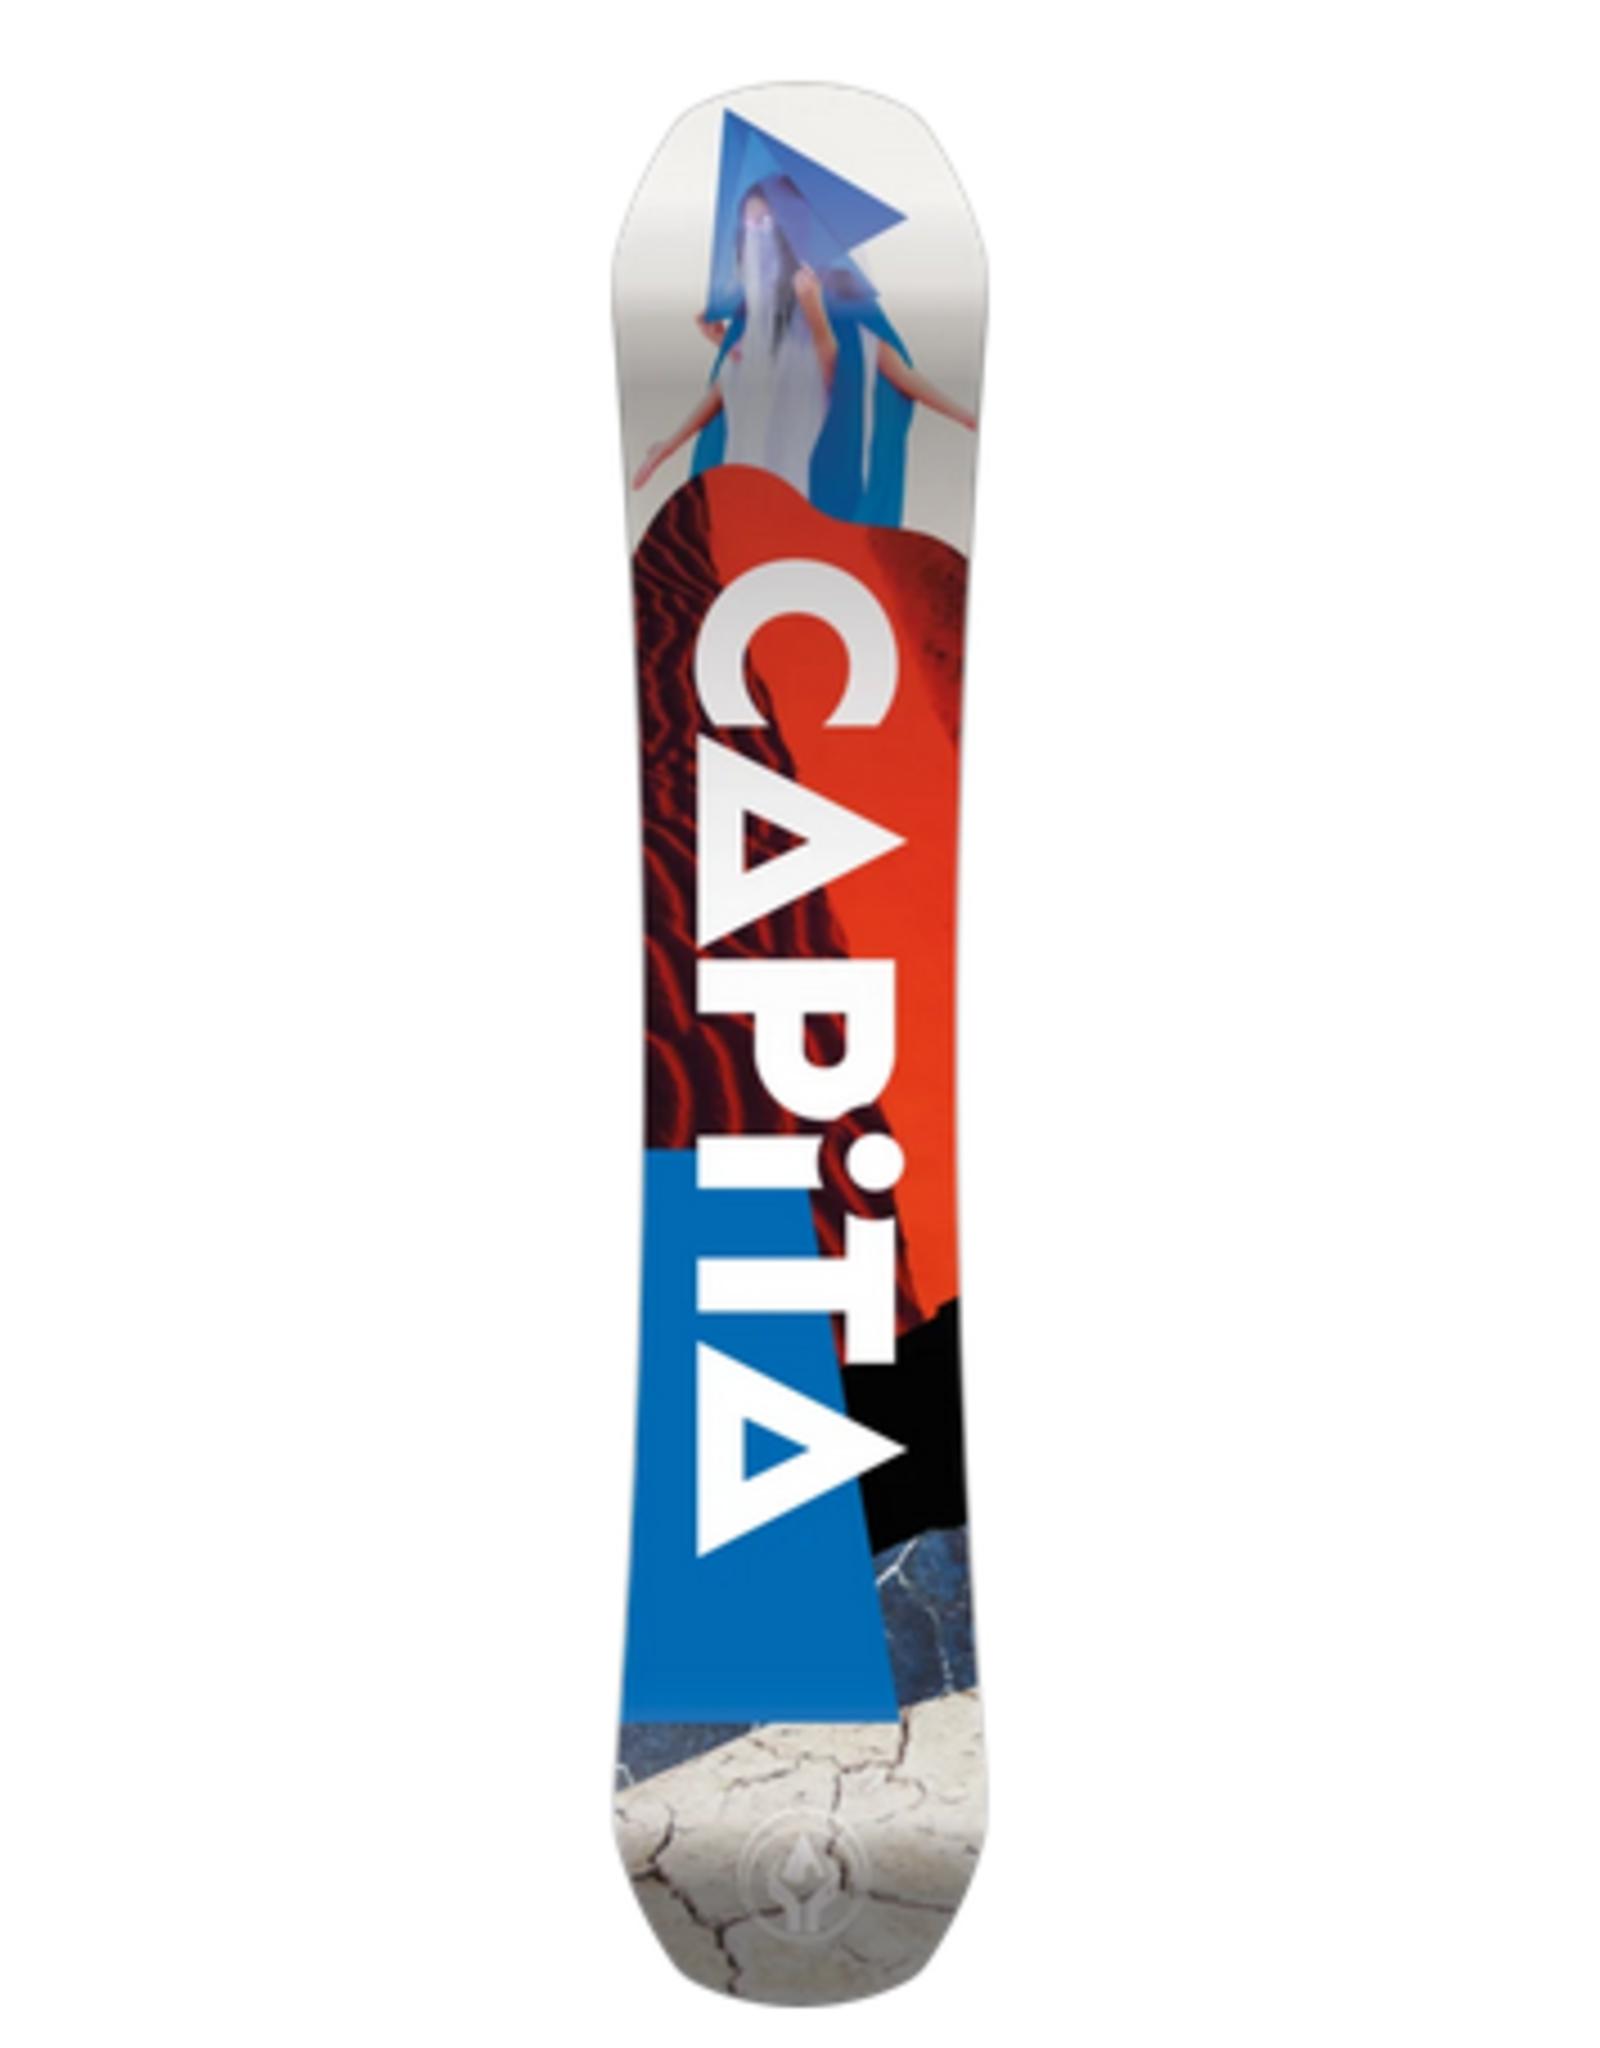 CAPITA CAPITA 2022 D.O.A. SNOWBOARD